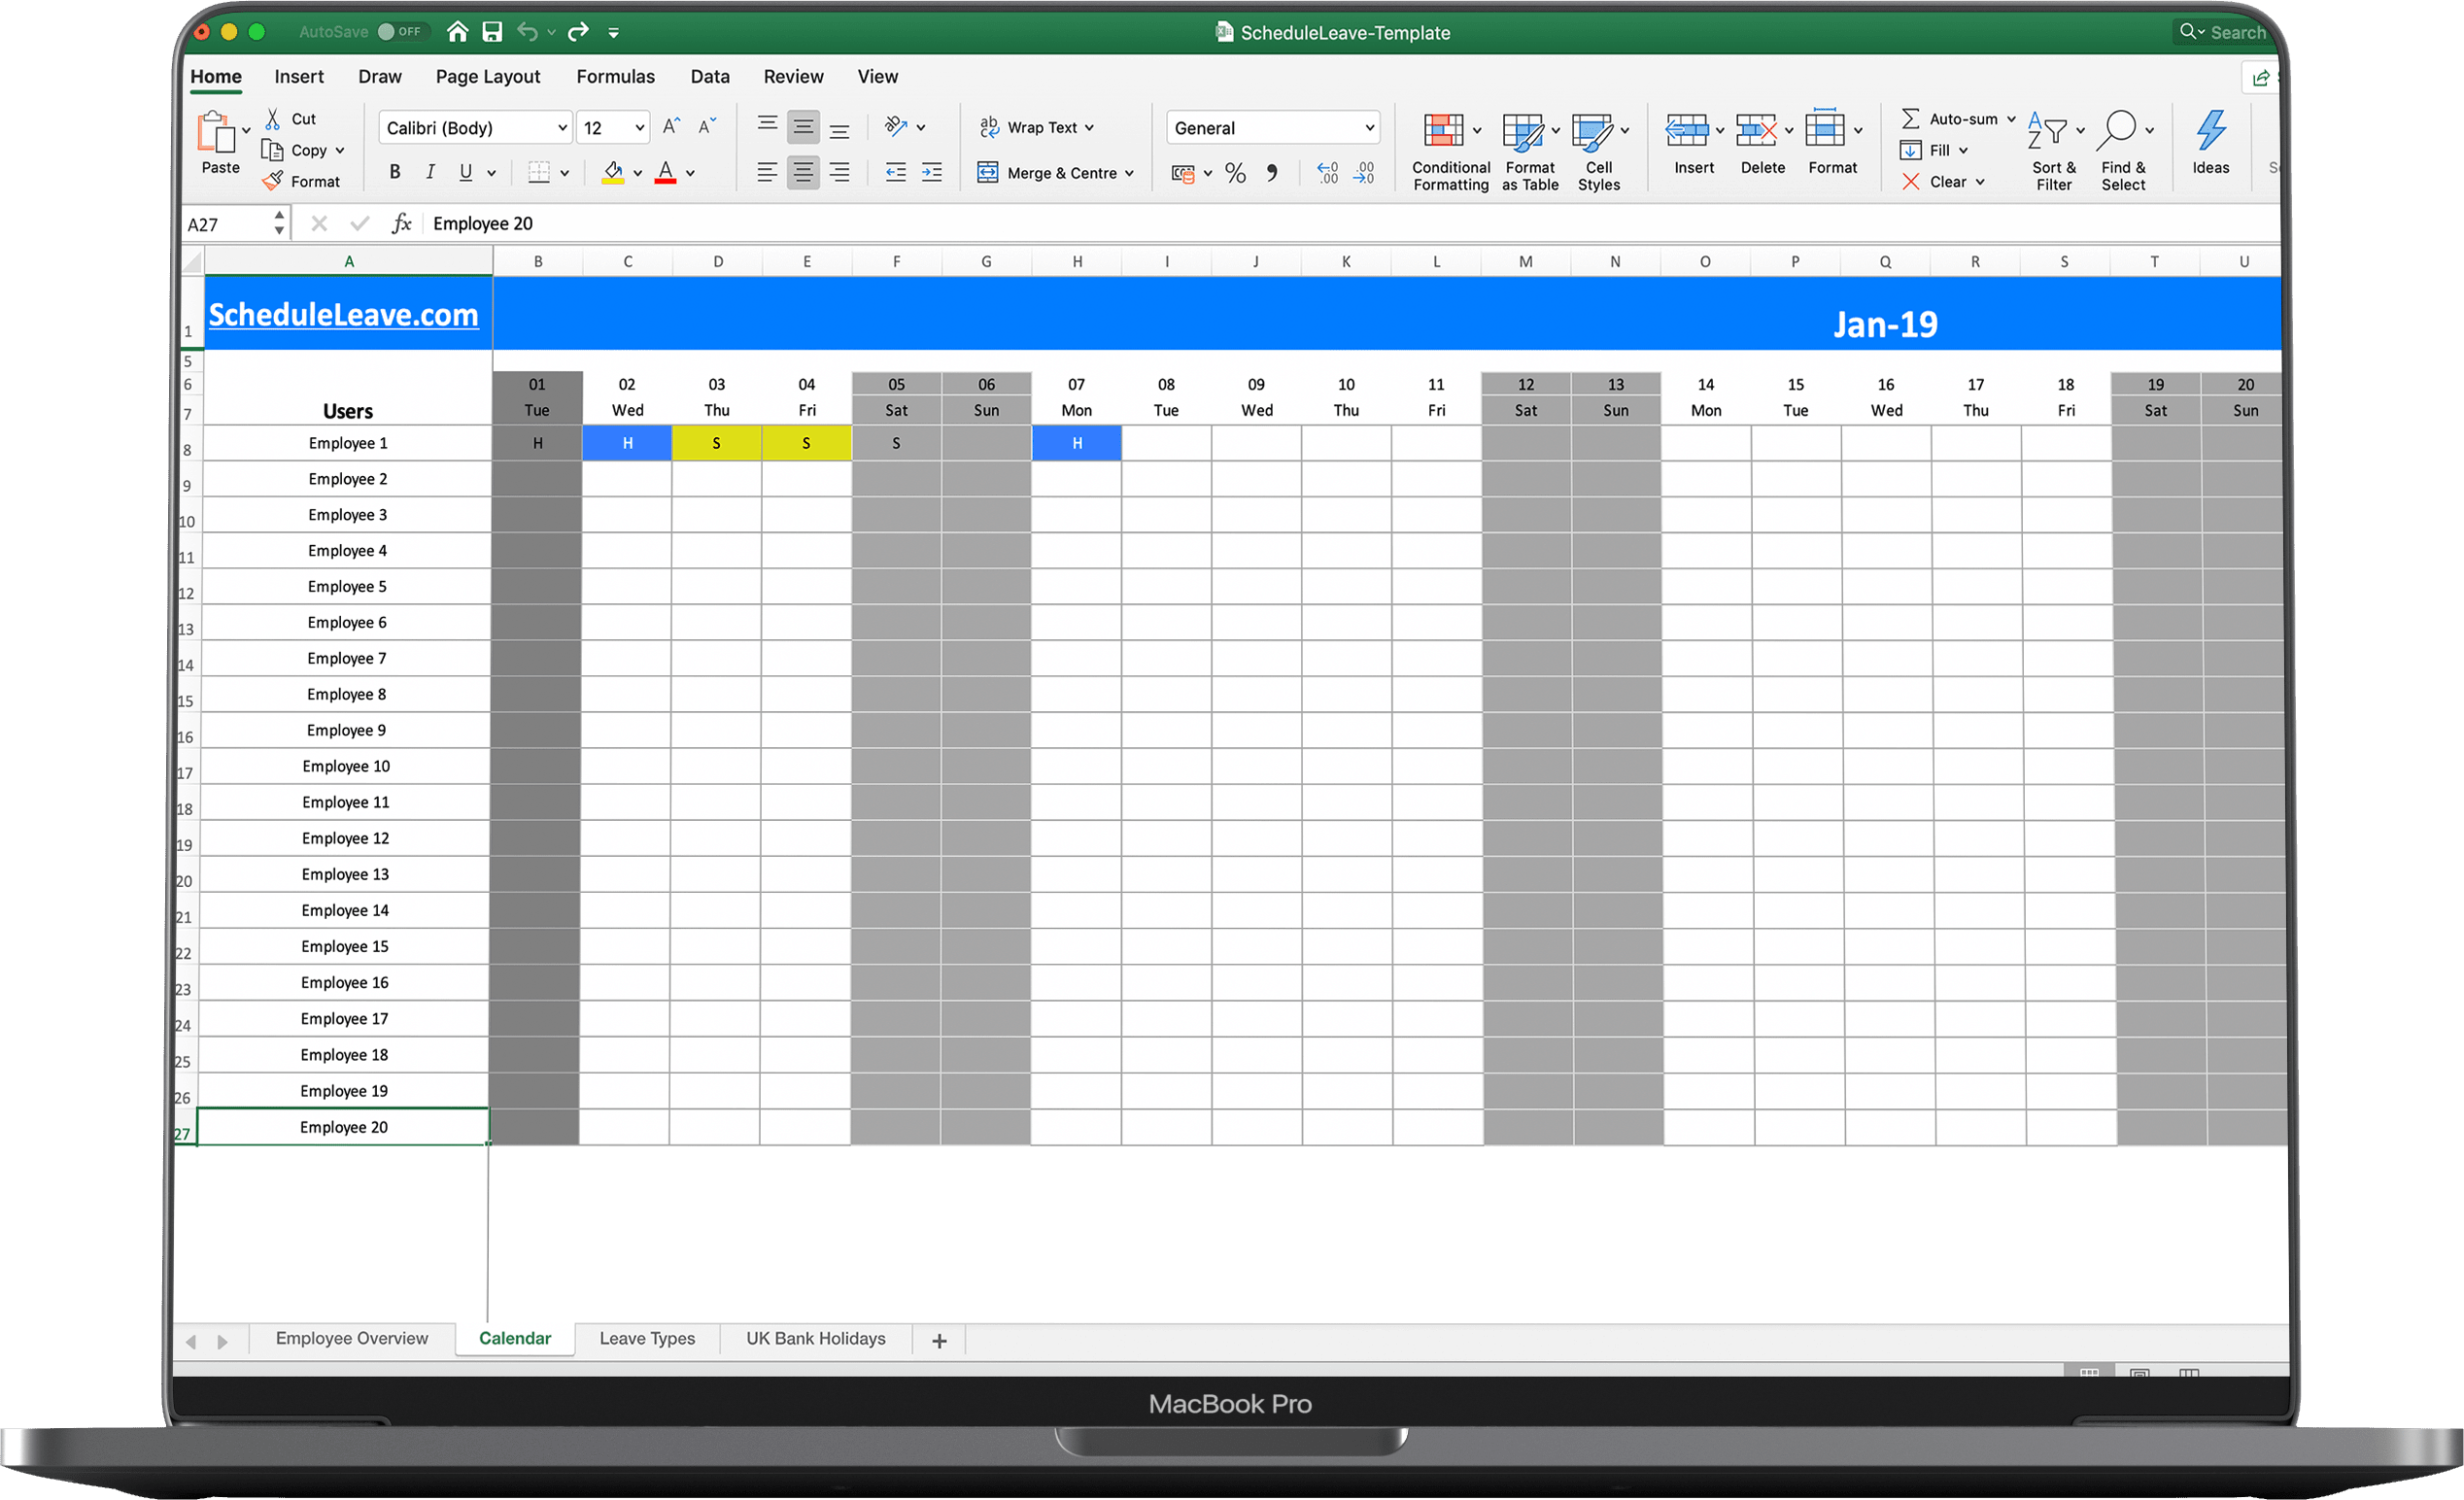 Excel Calendar Template 2020 from scheduleleave.com